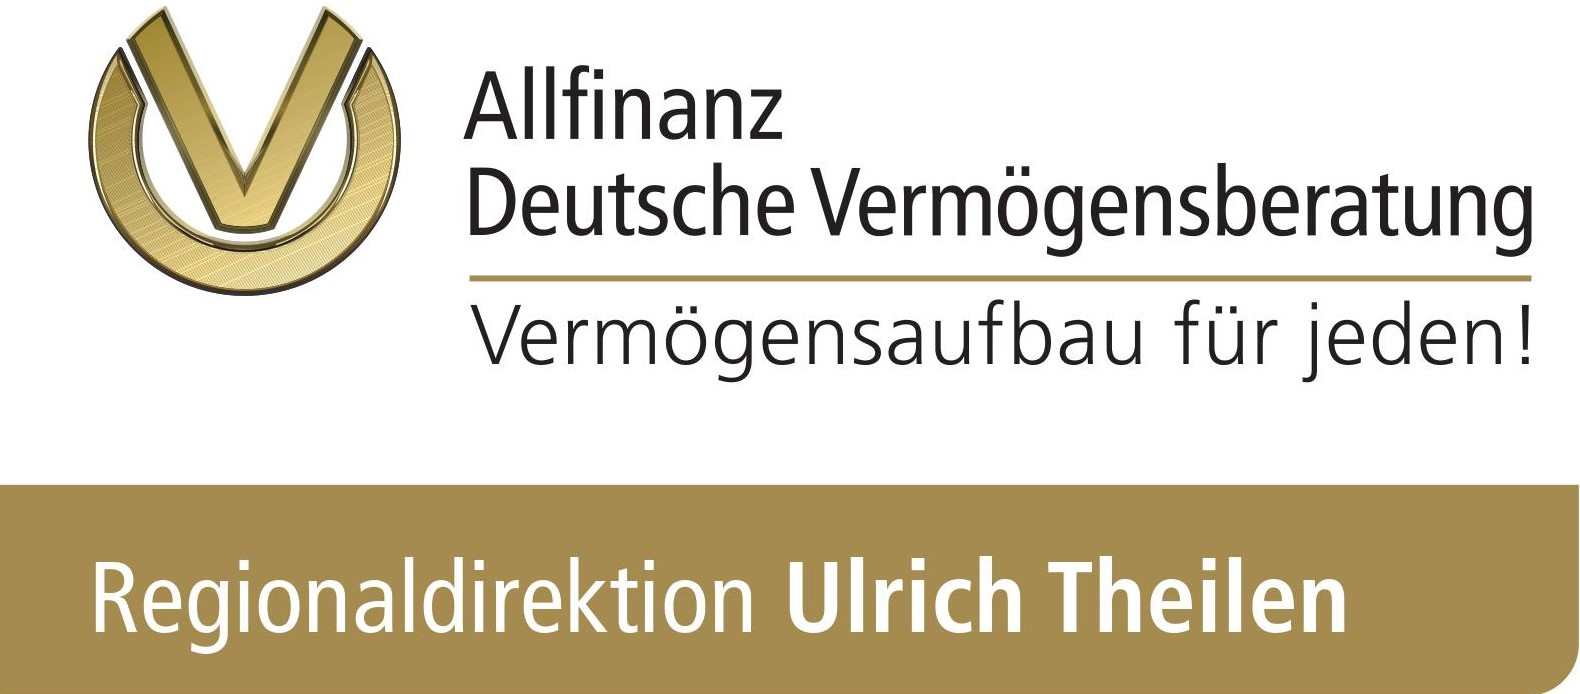 Deutsche Vermögensberatung(Hauptsponsor der German Roundnet Tour)